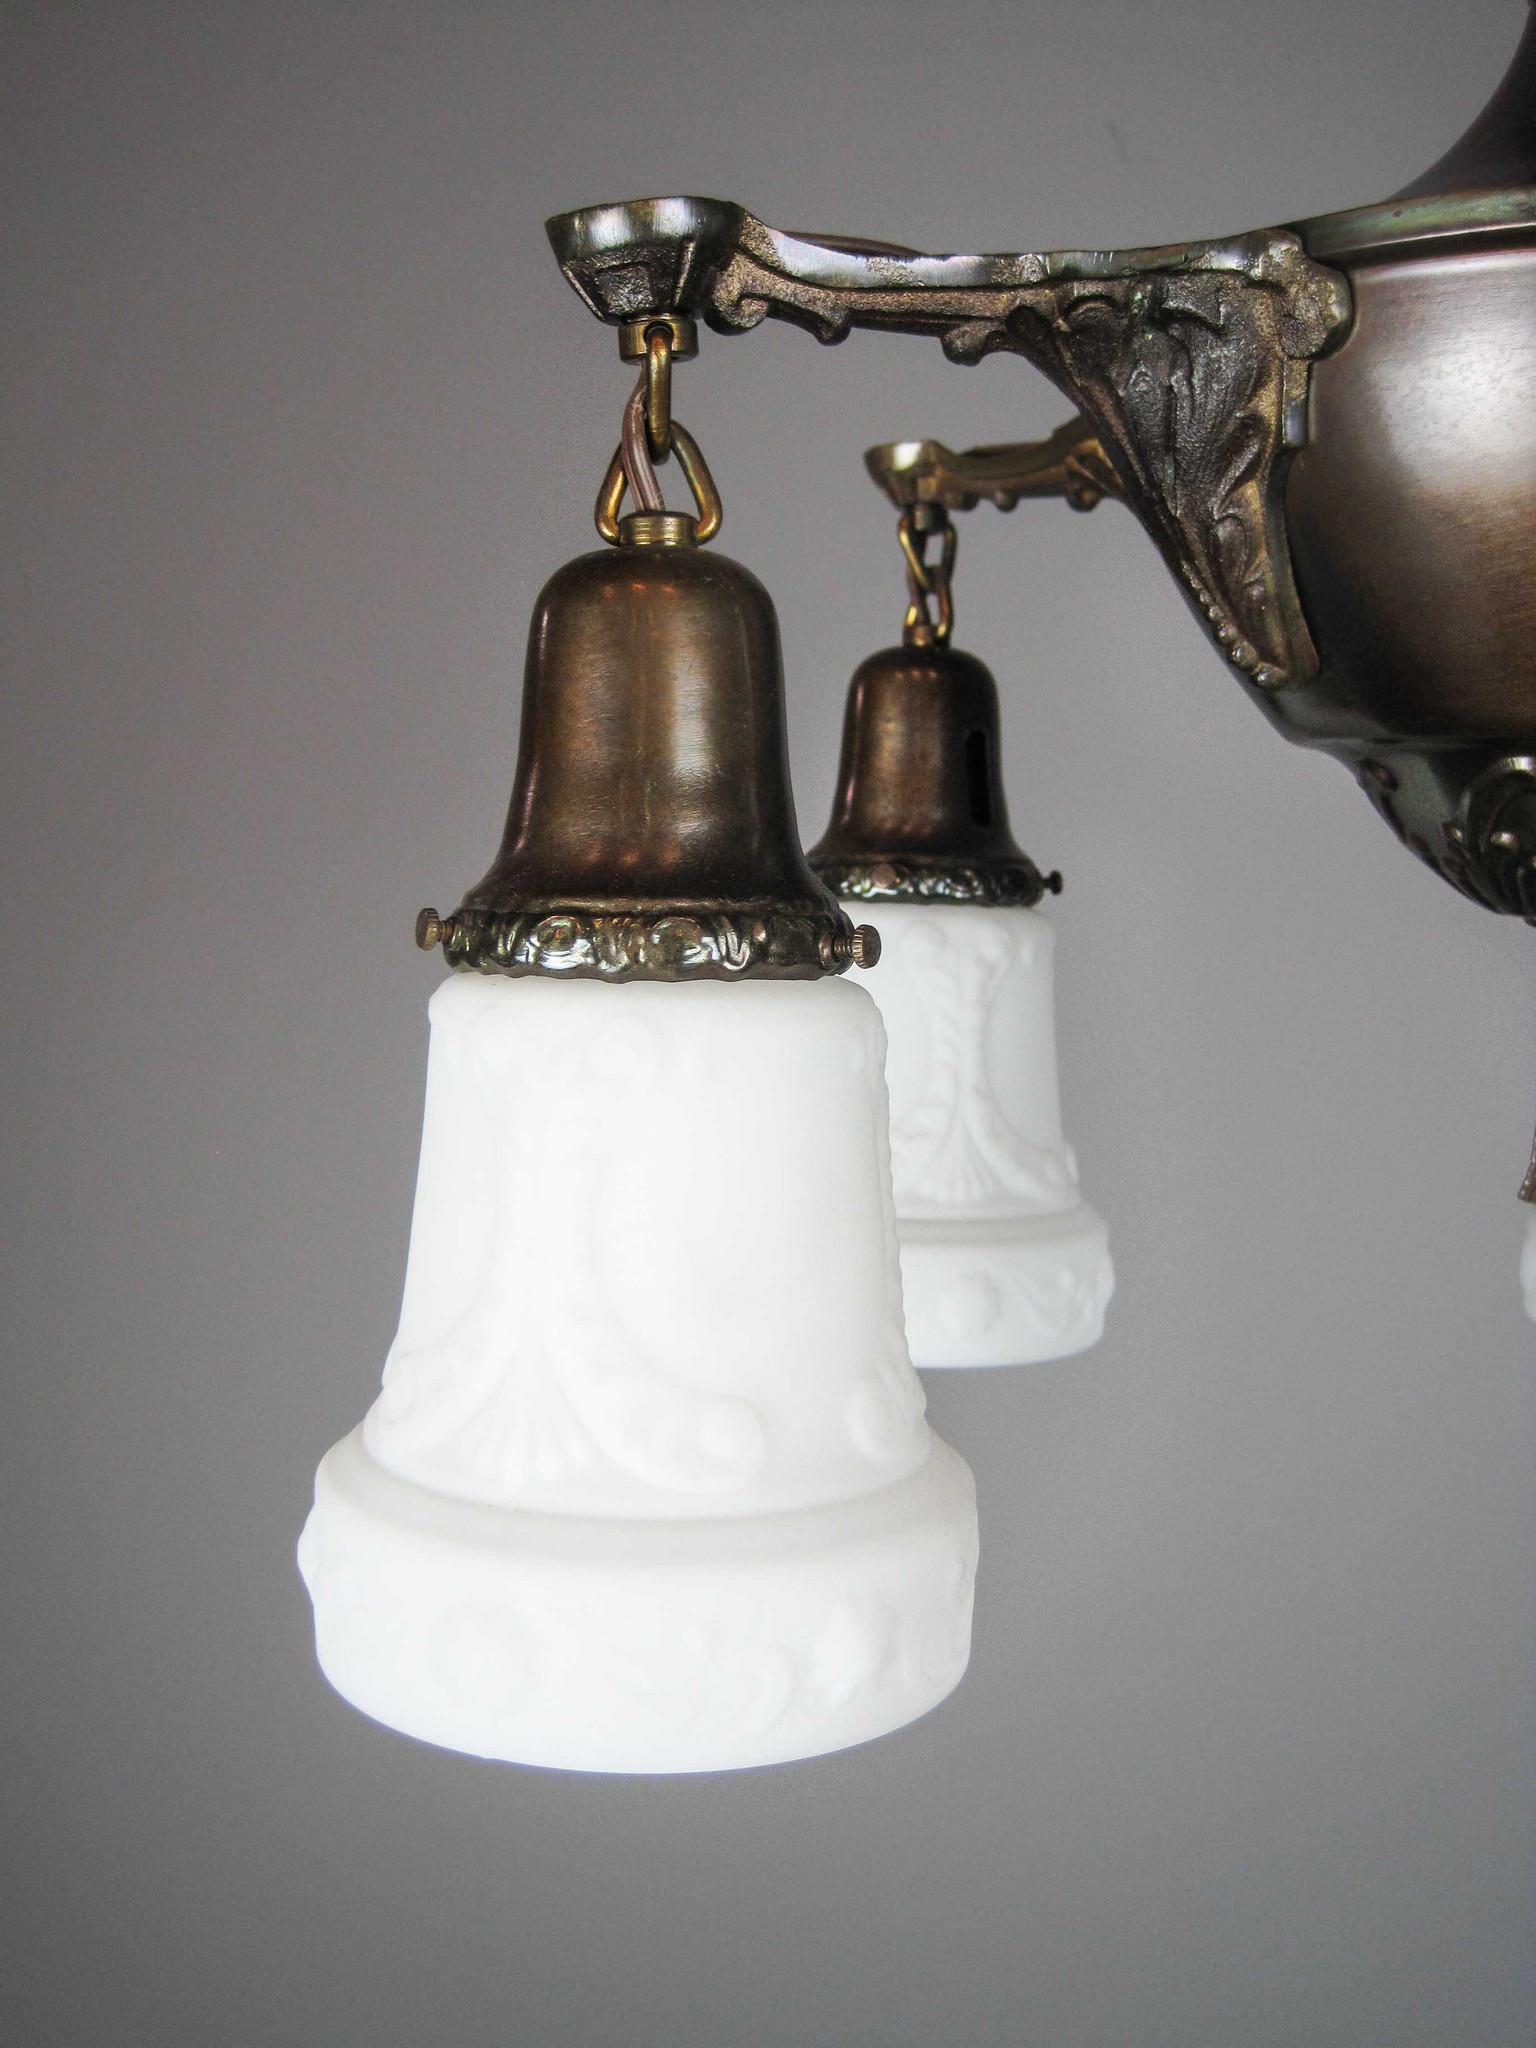 Original Pan Light Fixture 5 Light